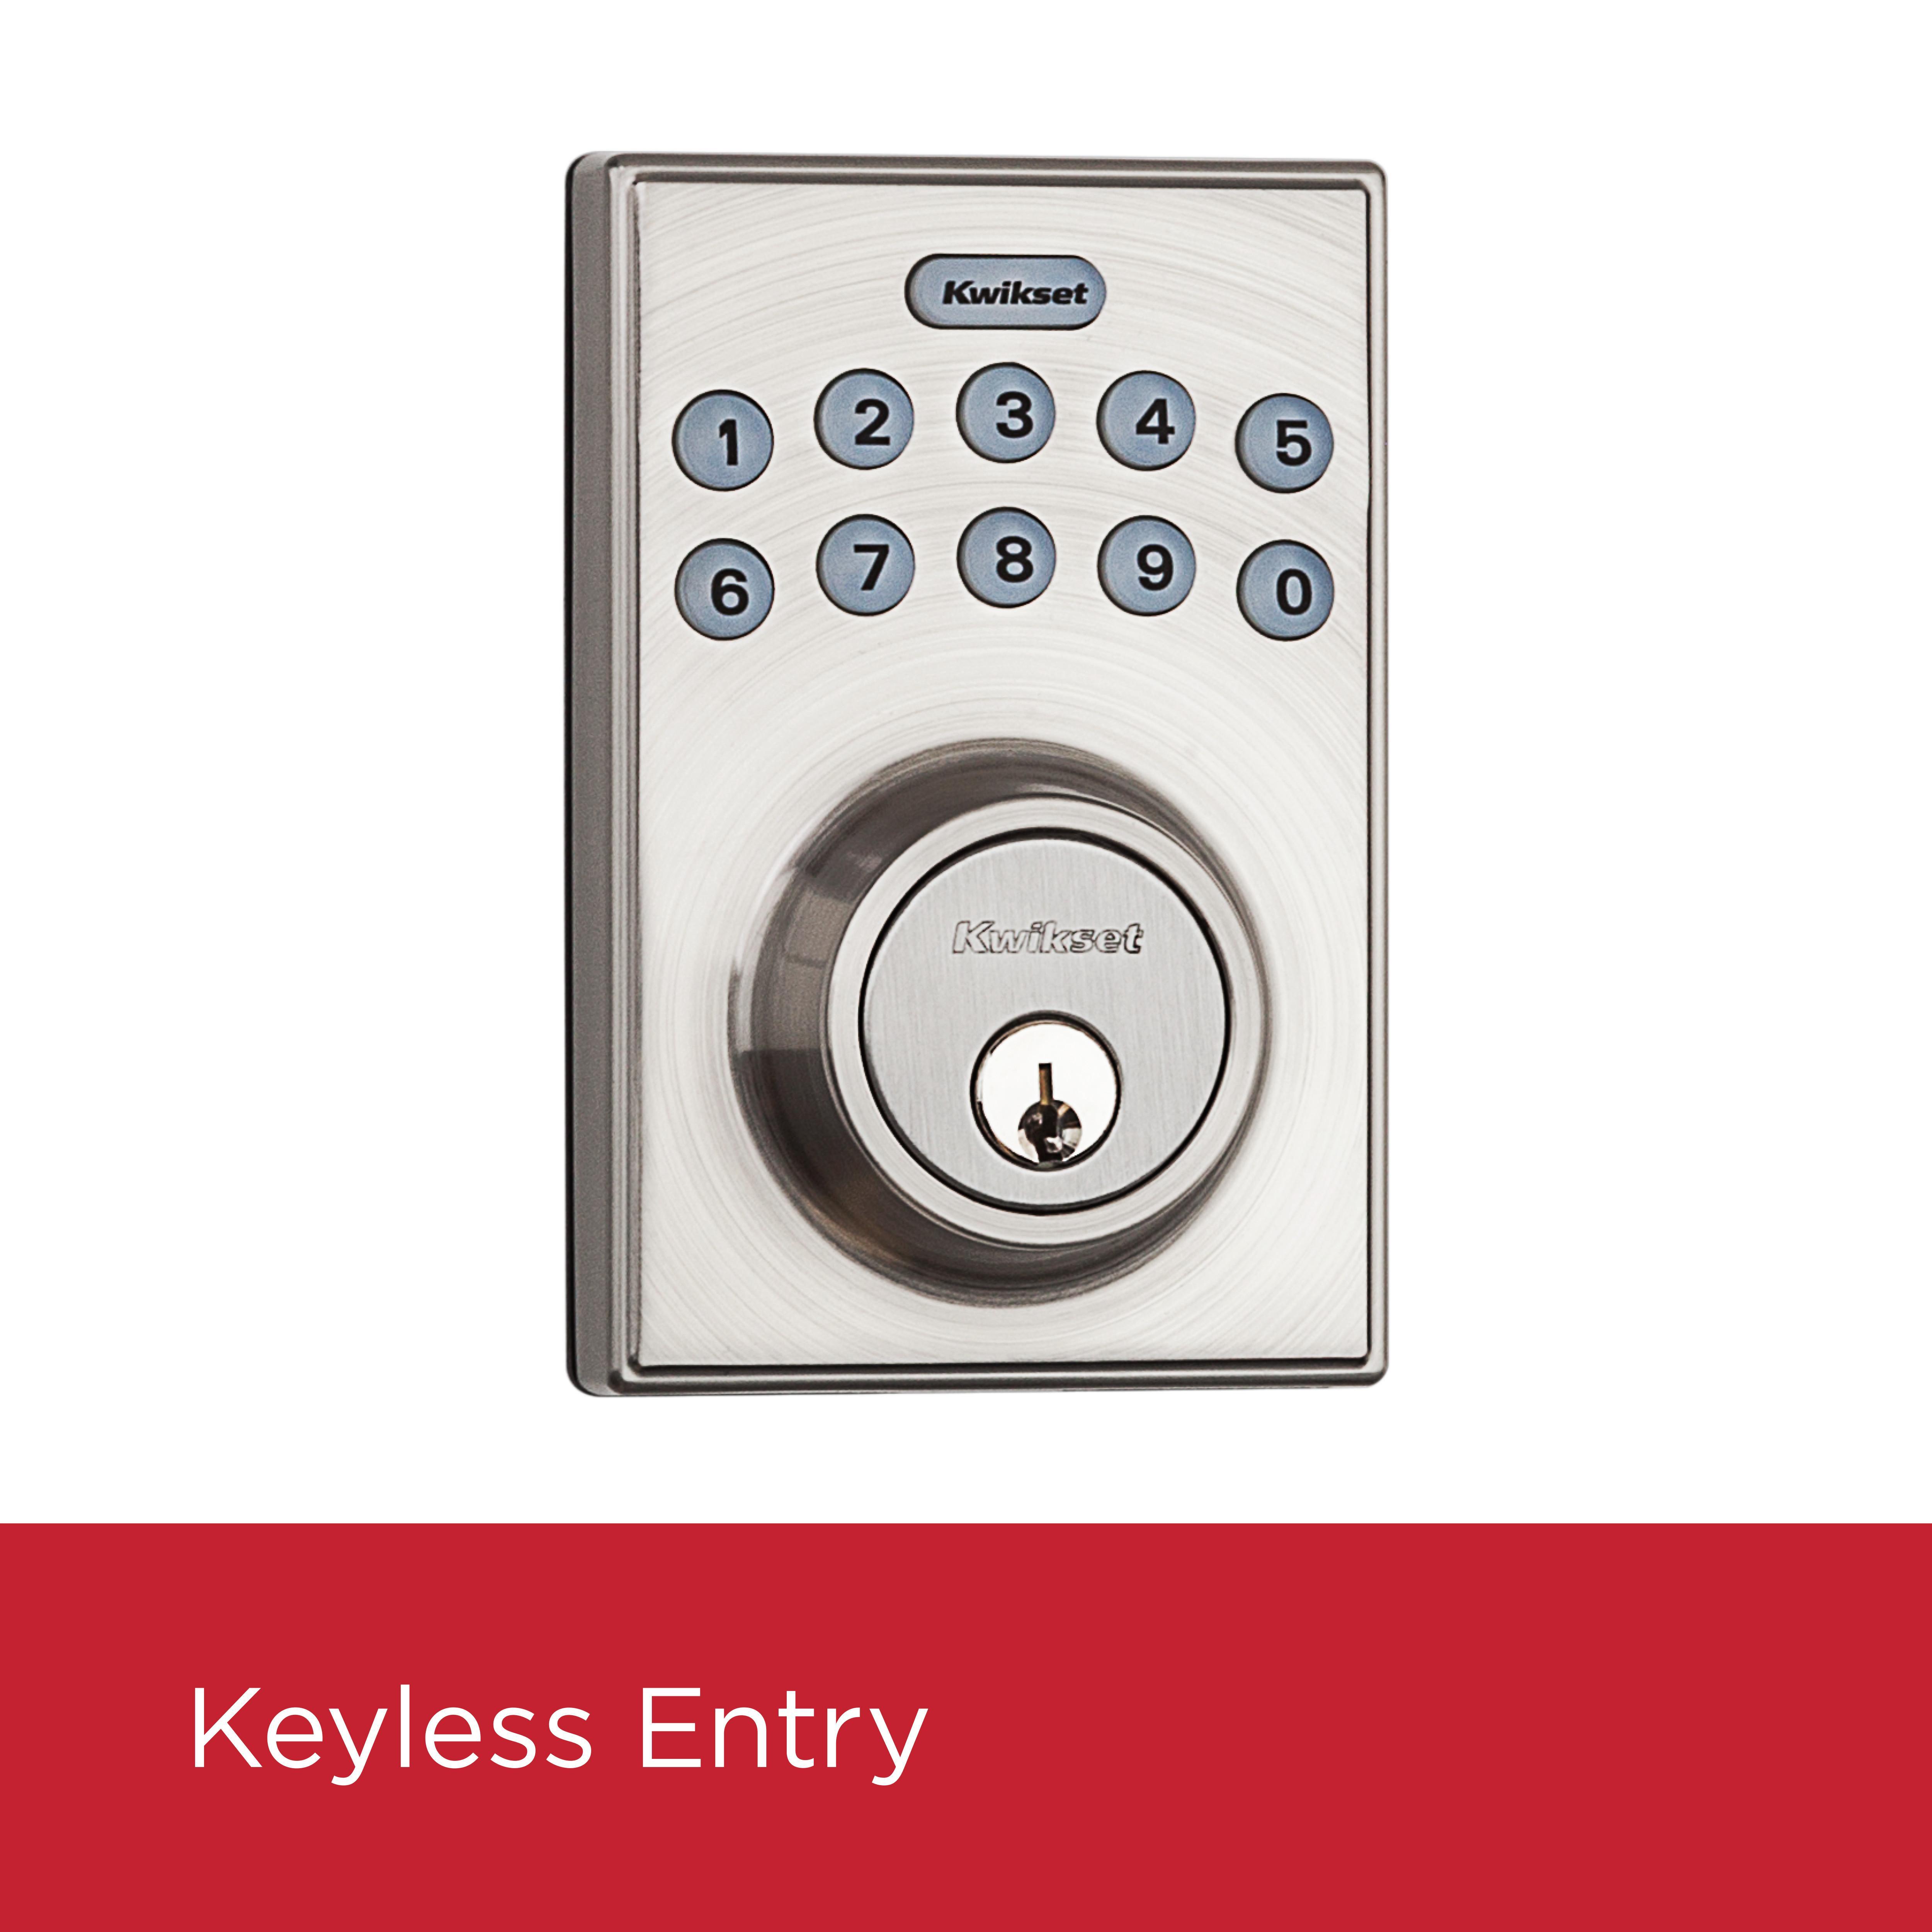 Kwikset 92640 001 Contemporary Electronic Keypad Single